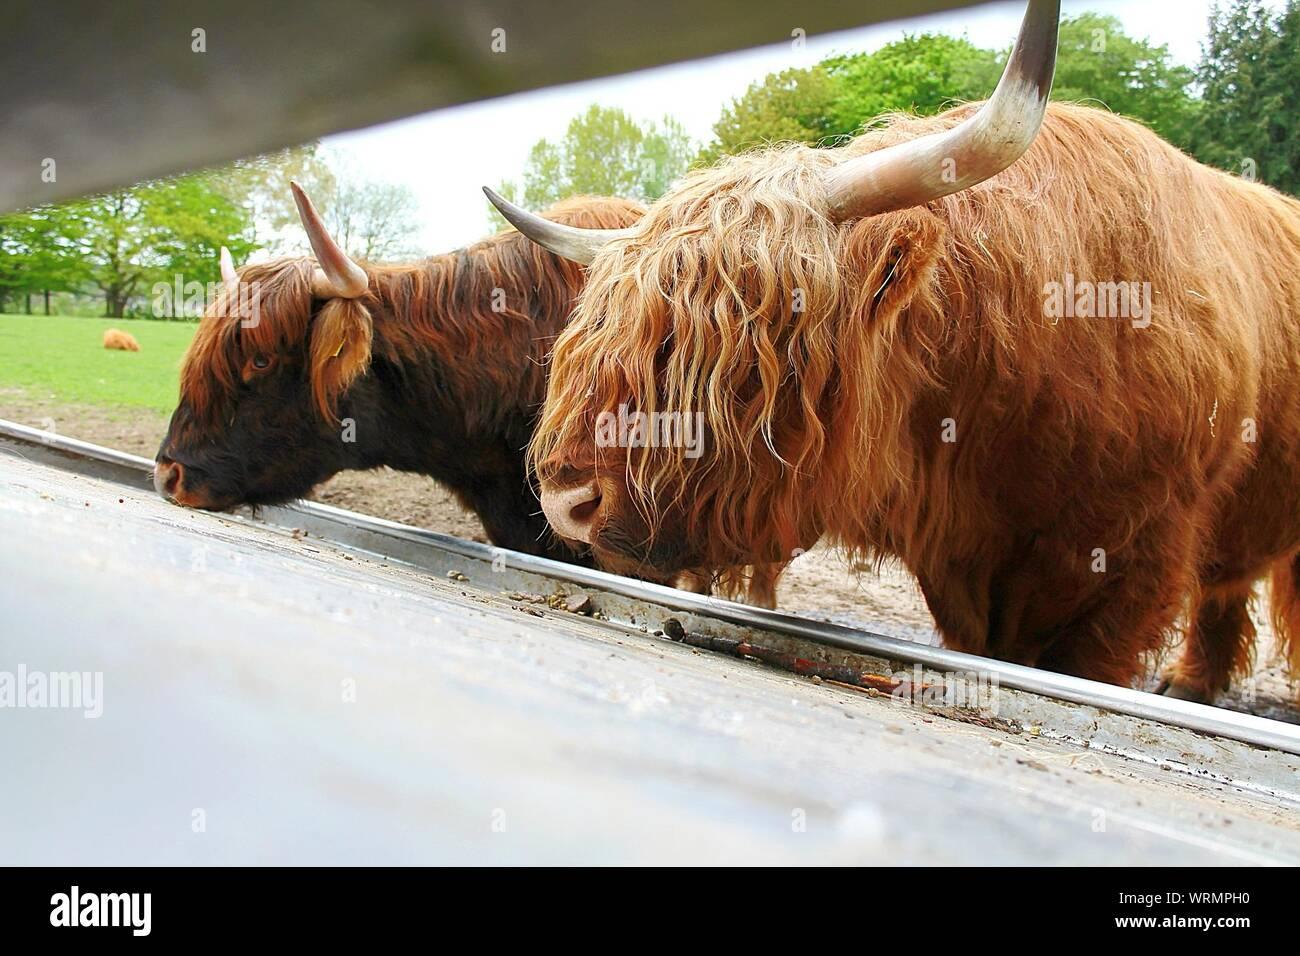 Highland Cattle Feeding At Schwarze Berge Wildlife Park Stock Photo